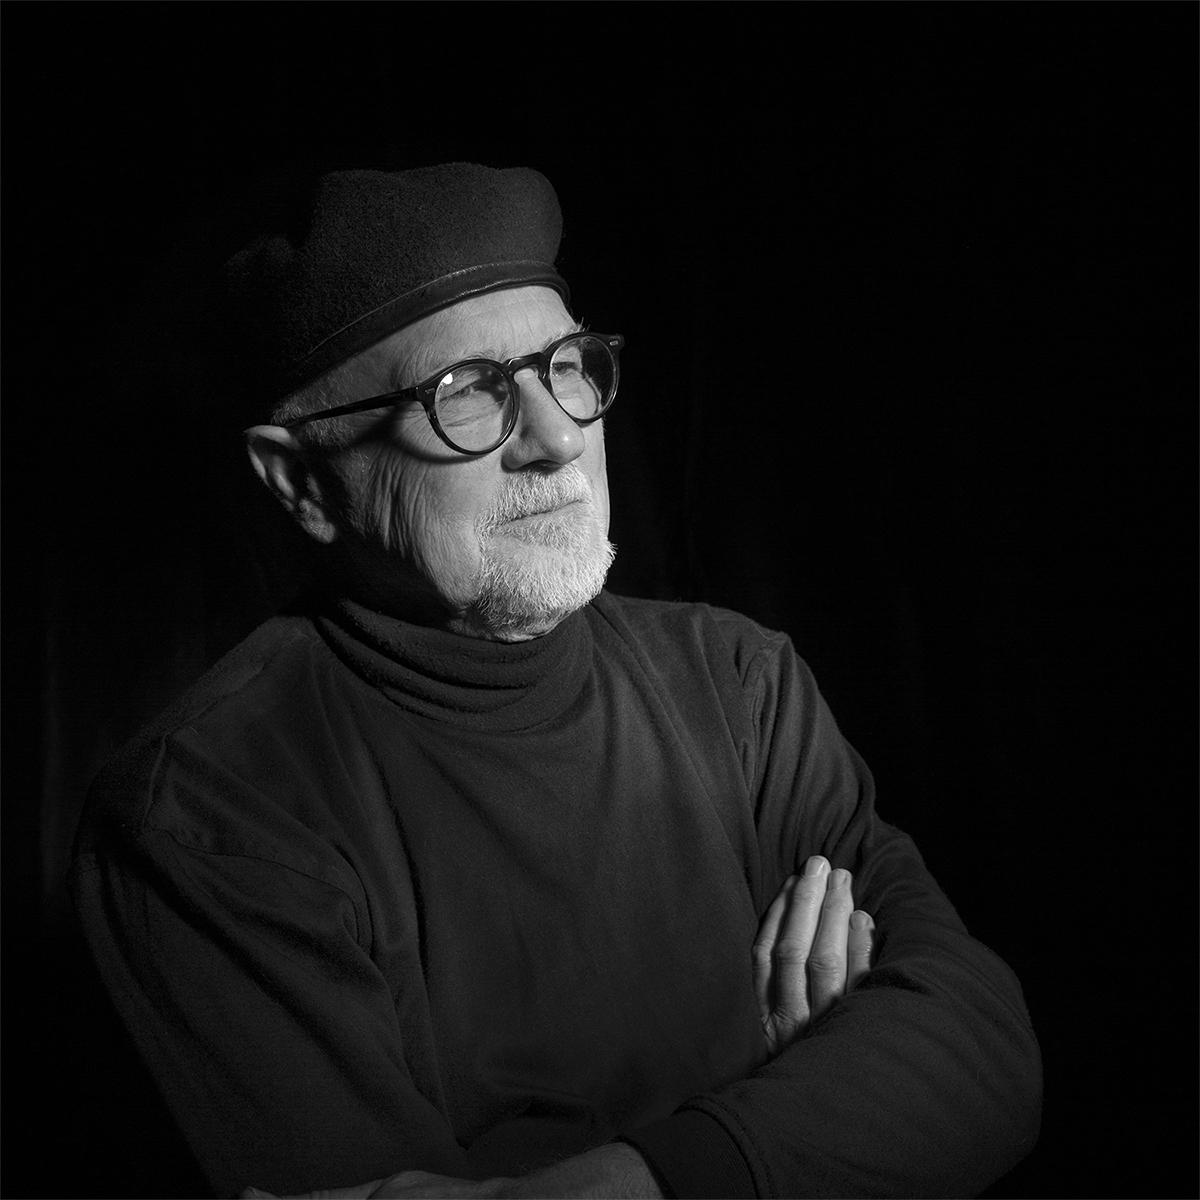 Photograph by Tracy Ponich: Portrait of Artist David Wardman